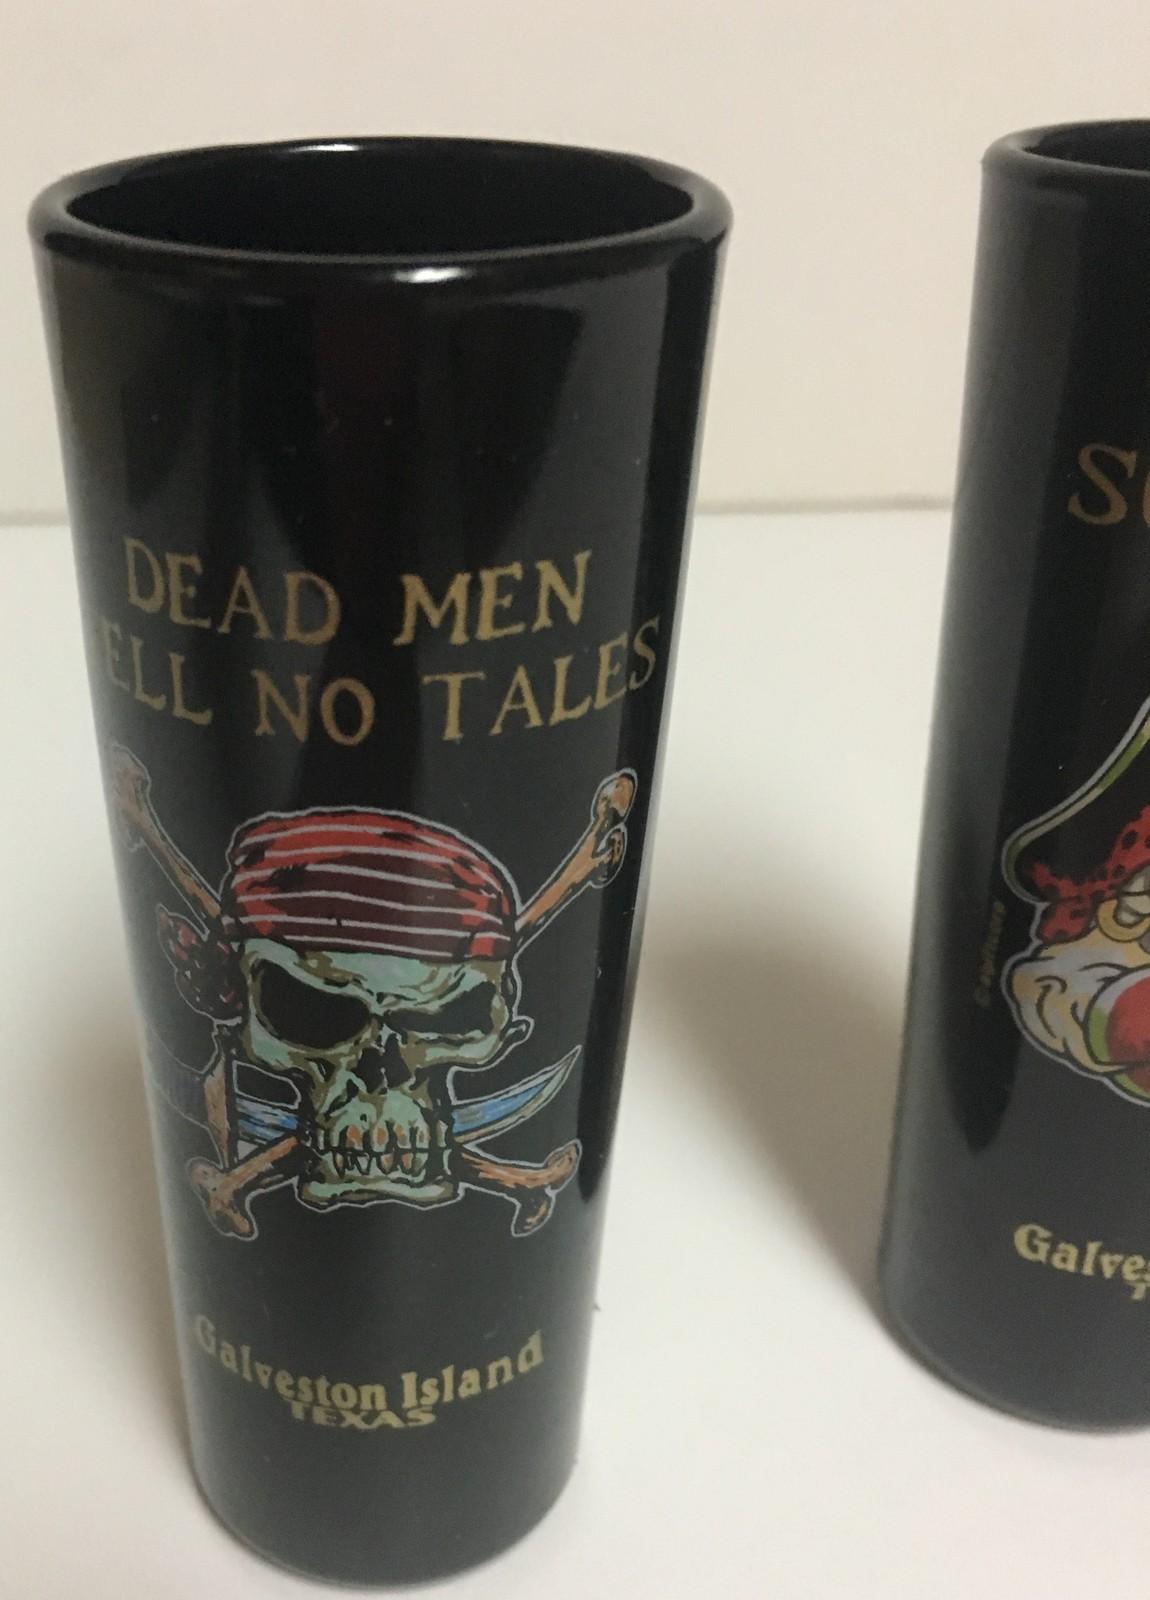 Galveston Island Texas Souvenir Shot Glasses Set of 2 Surrender No Tales 2 Oz.